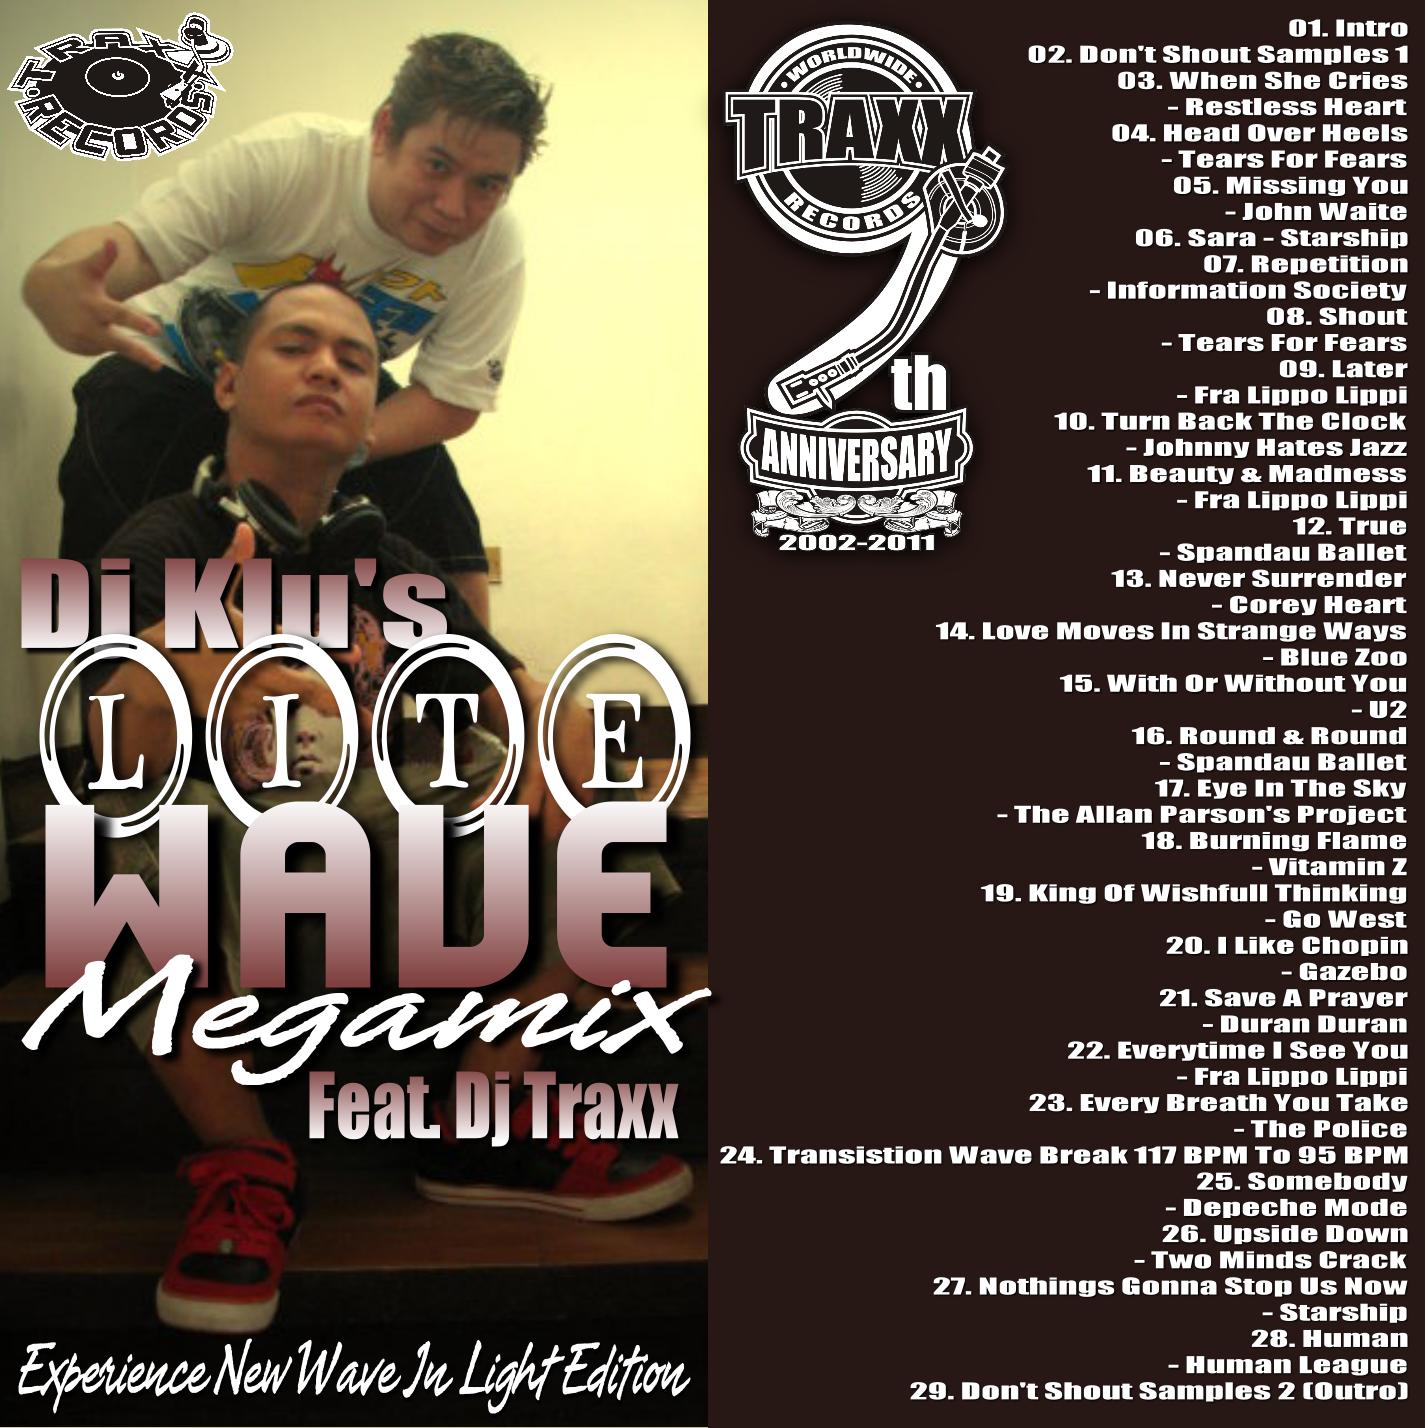 Upside Original Free Mp3 Download - Mp3songfree